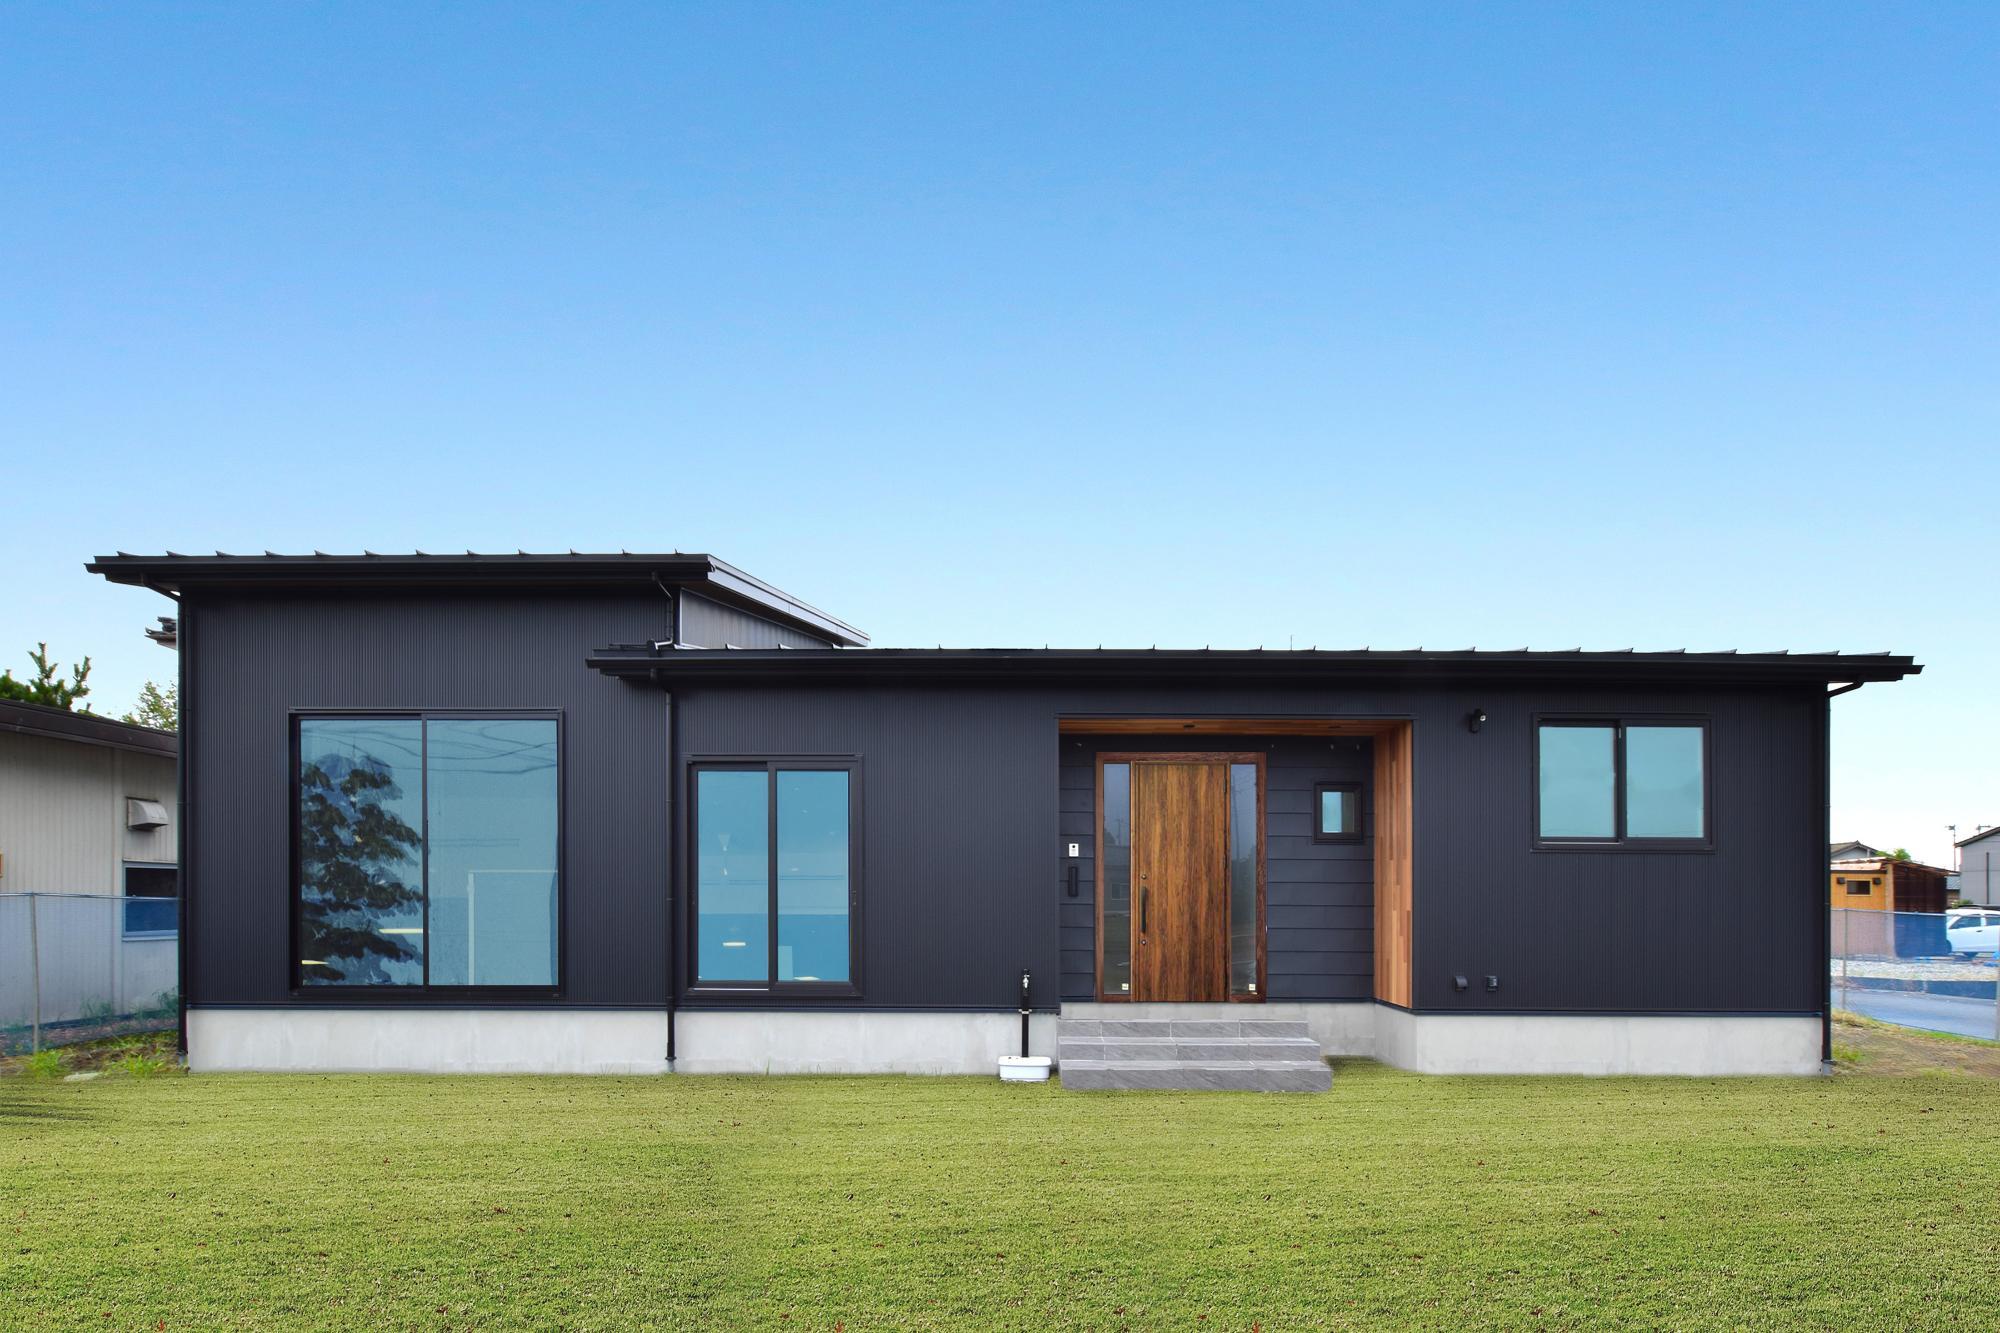 DETAIL HOME(ディテールホーム)「光と風、ローケションを楽しみ、時を過ごせる平屋」のシンプル・ナチュラル・モダンな外観の実例写真